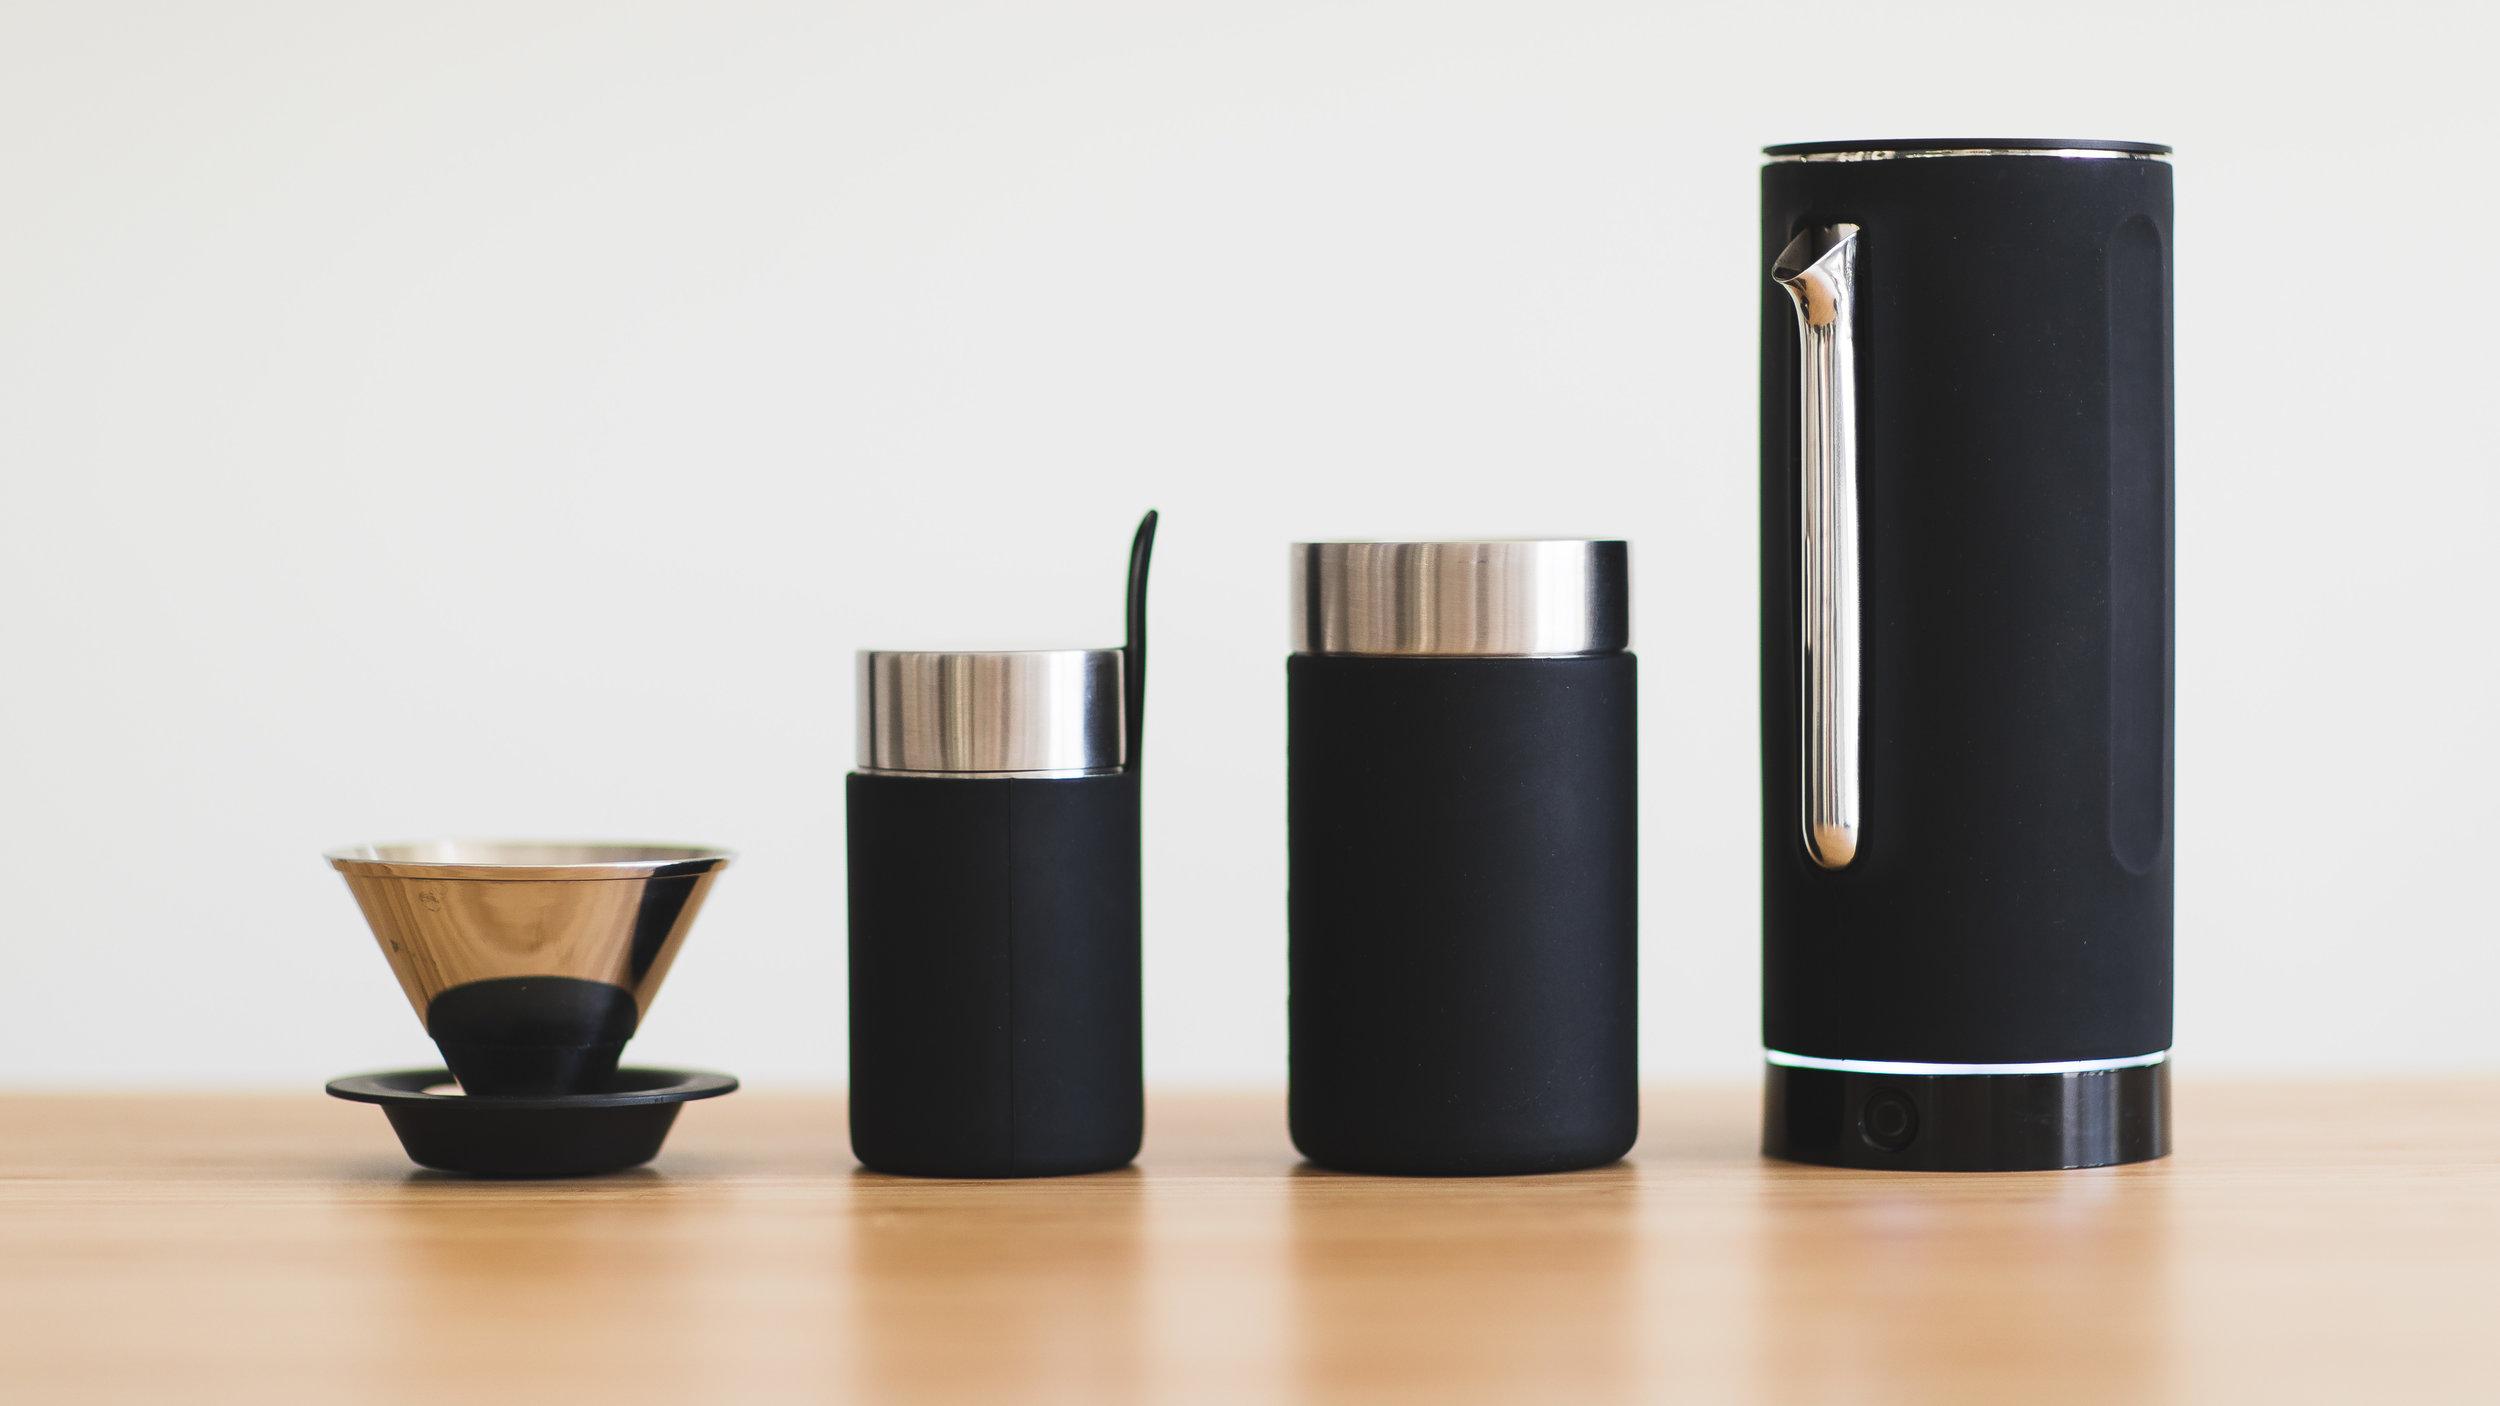 Pakt Coffee Kit